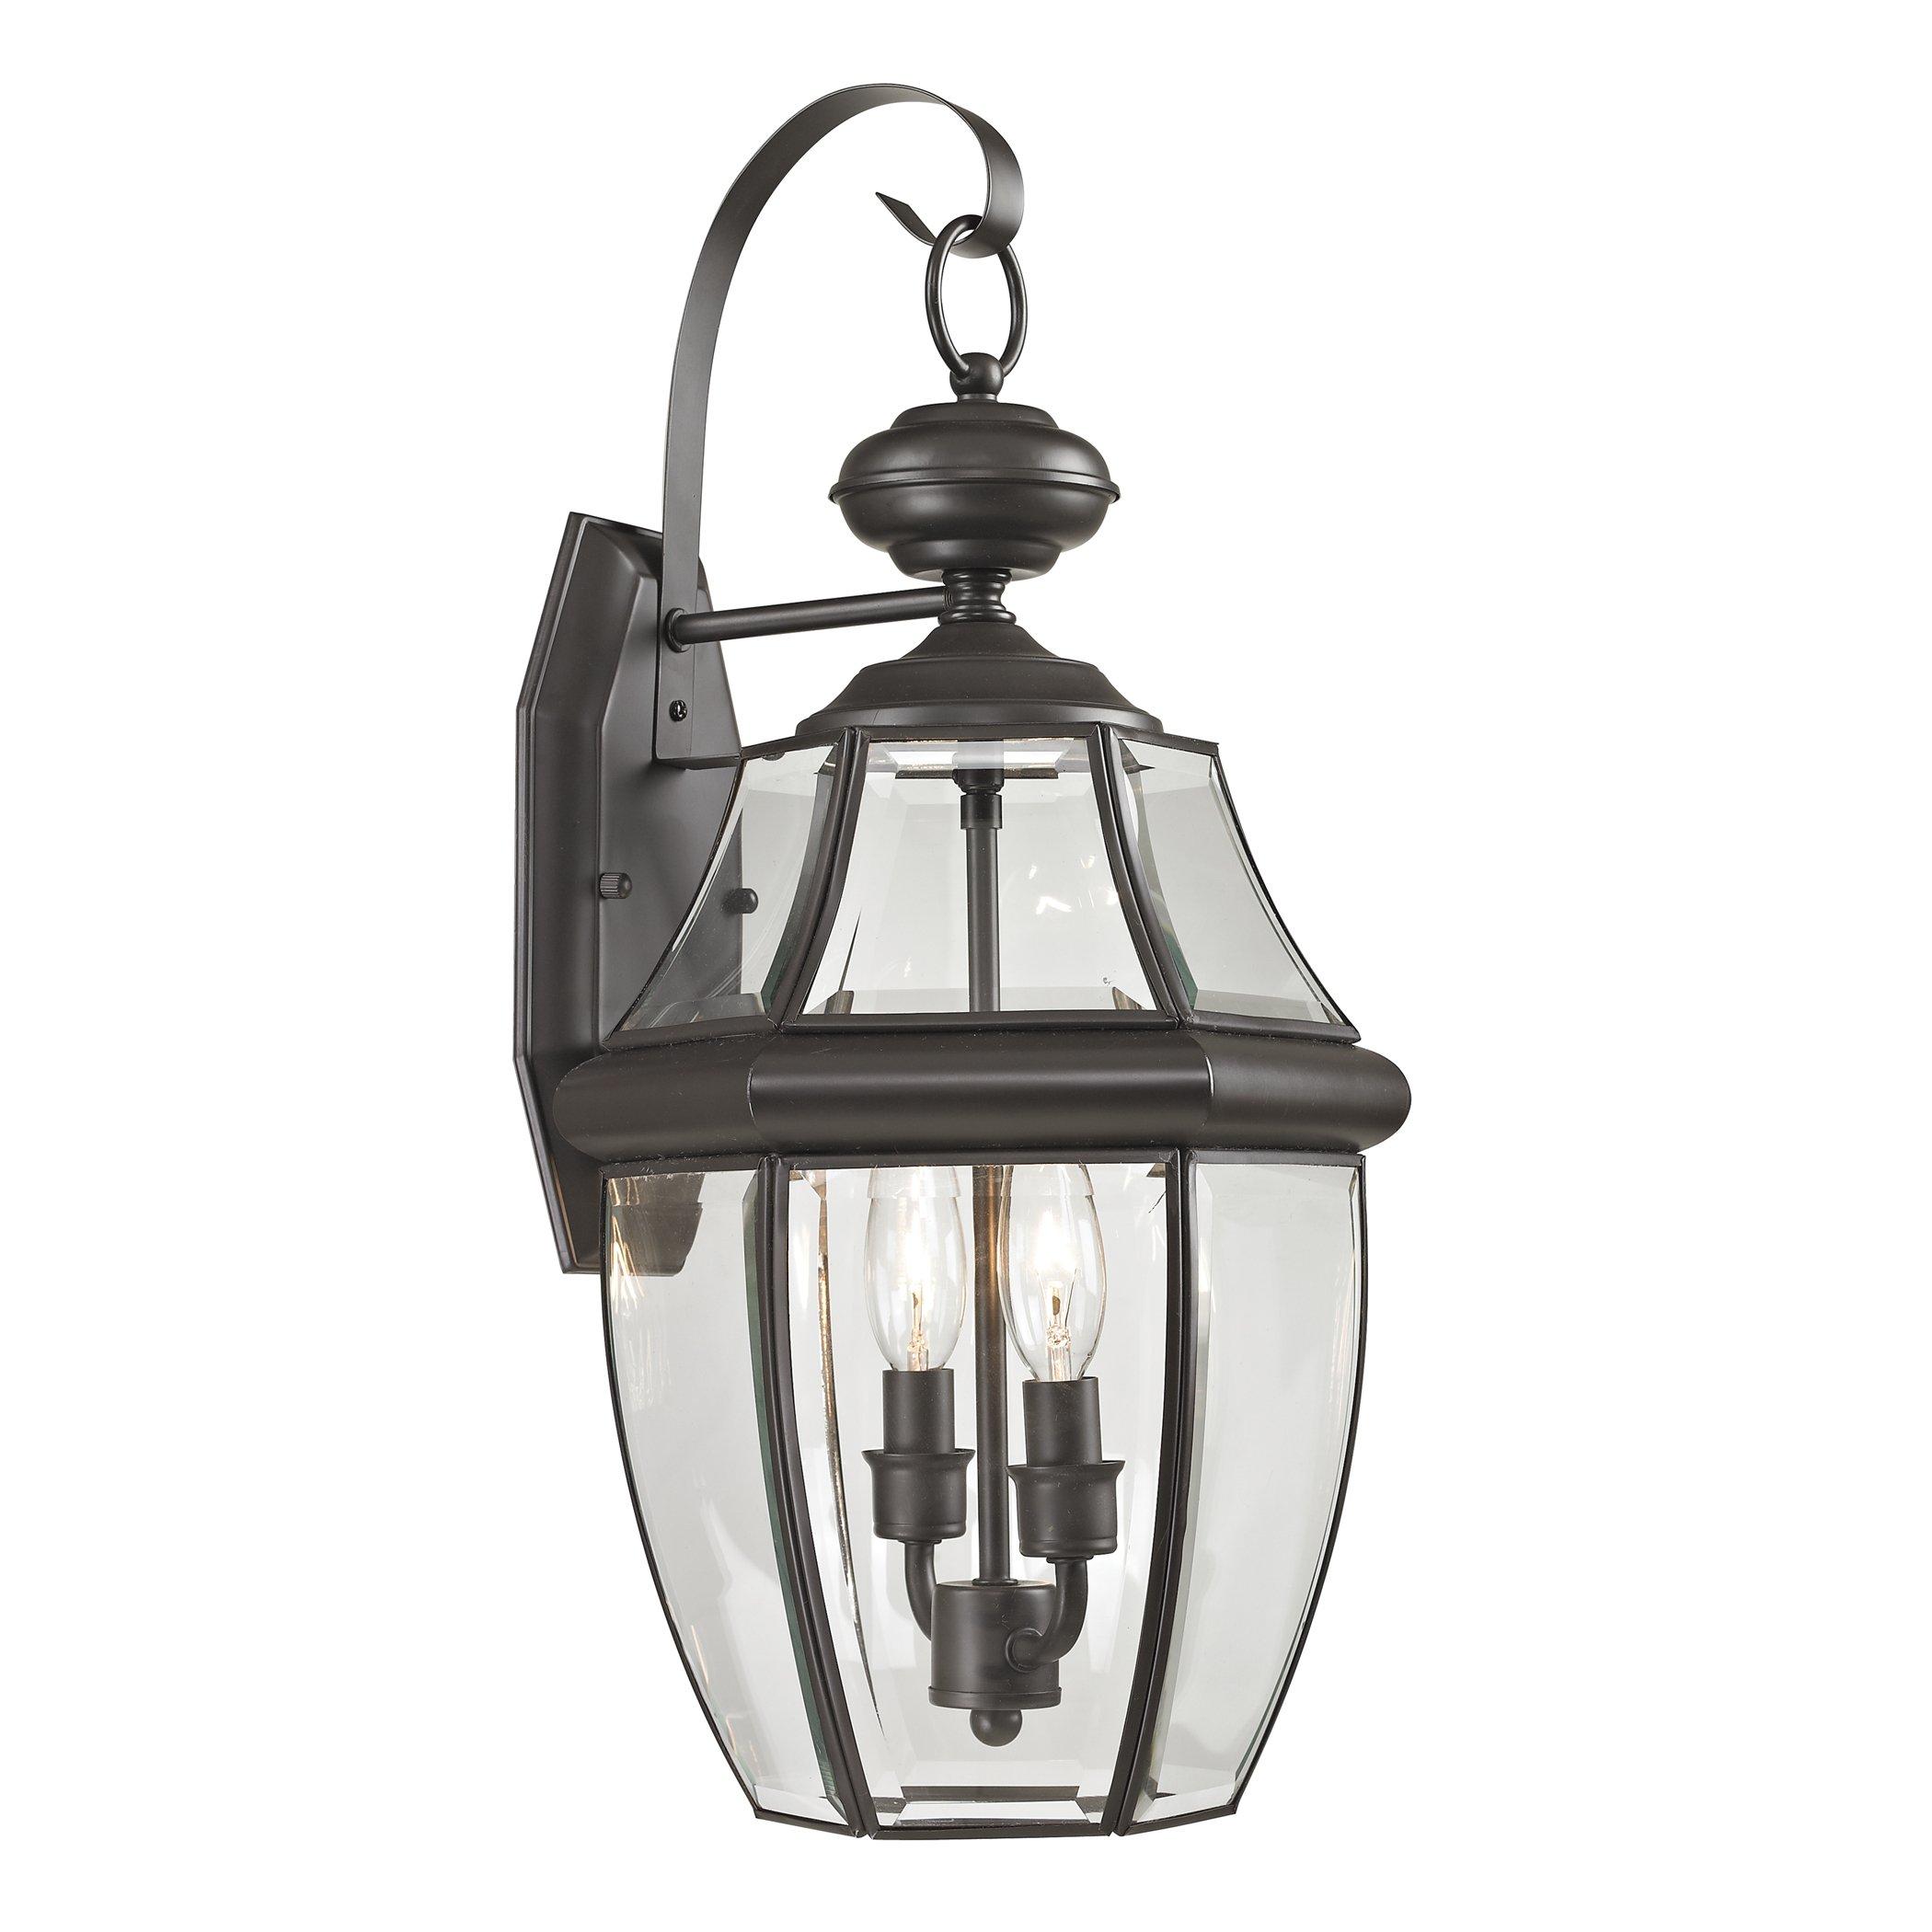 Cornerstone Lighting 8602EW/75 Ashford 2 Light Exterior Coach Lantern, Oil Rubbed Bronze